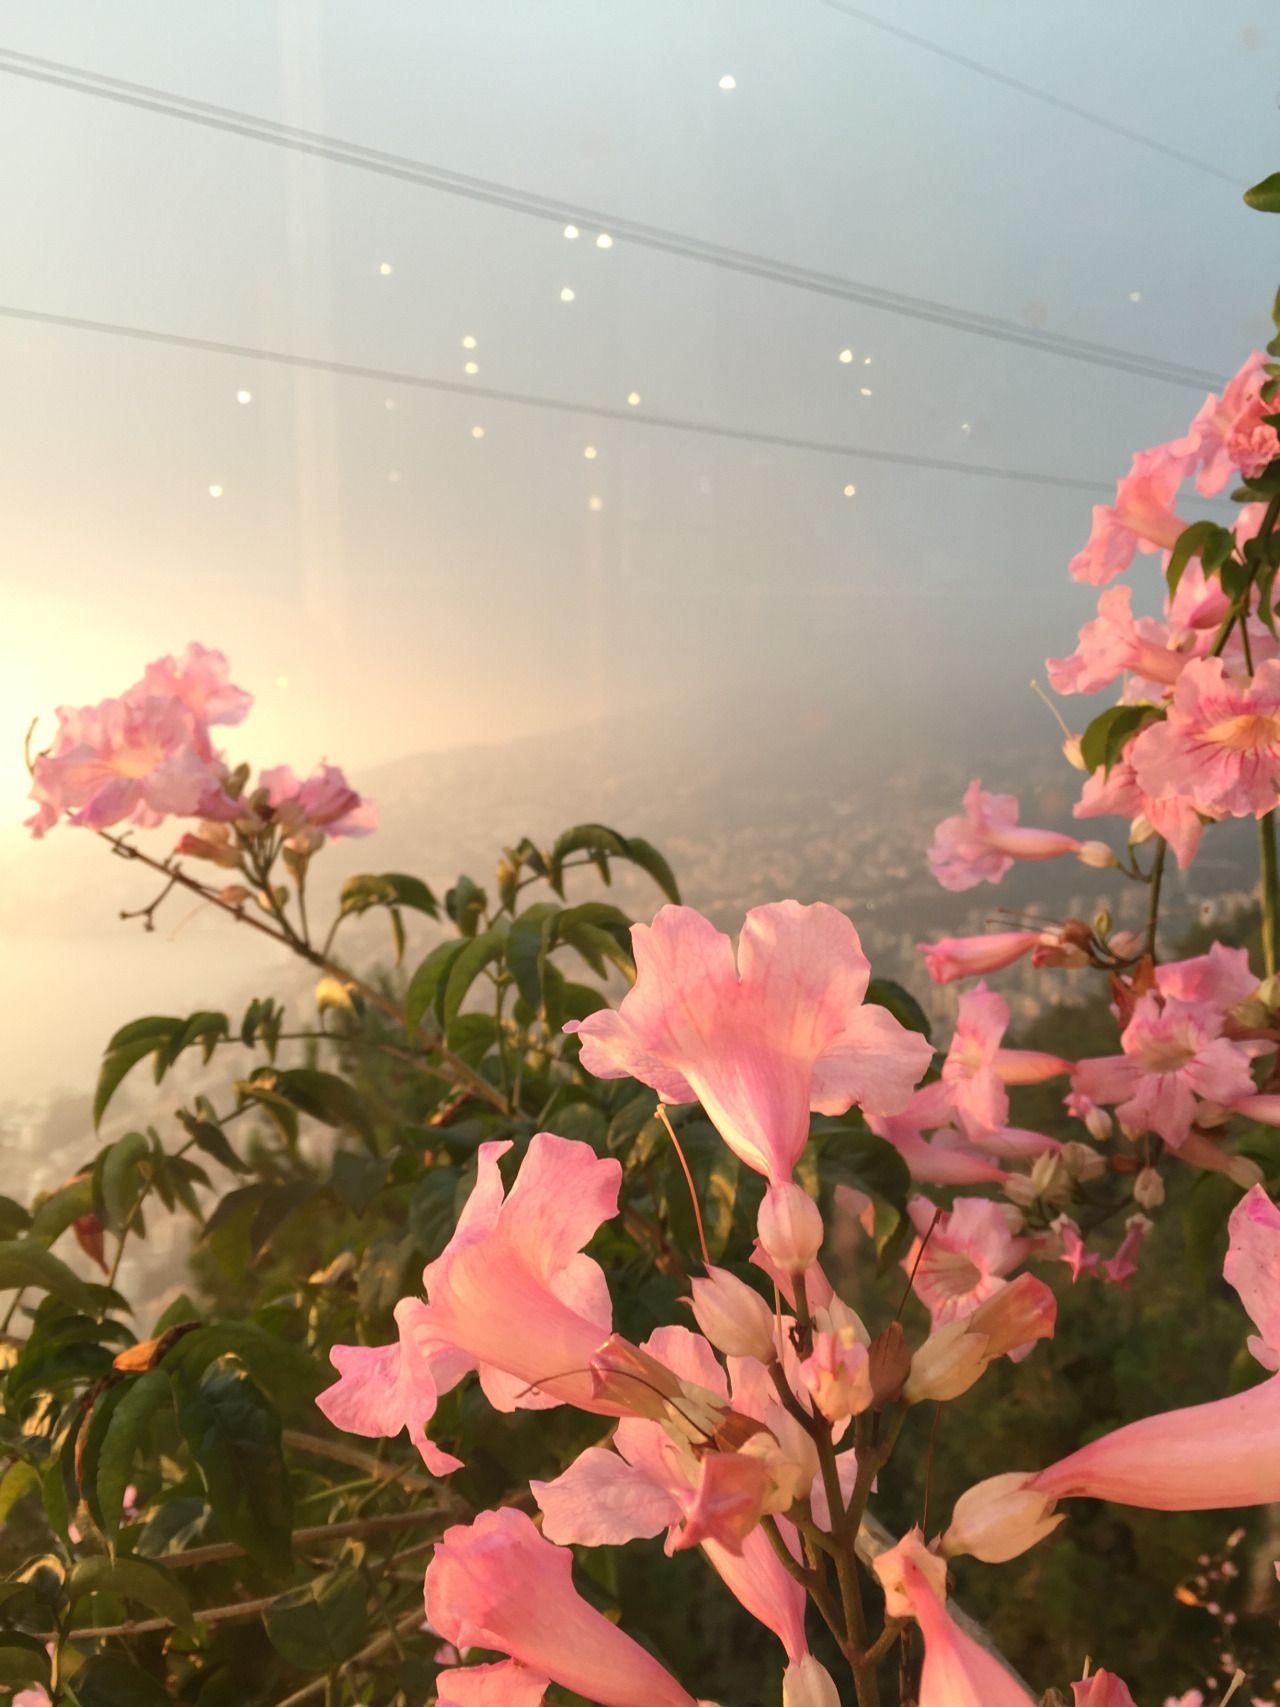 Kawaii Shop Flower aesthetic, Plants